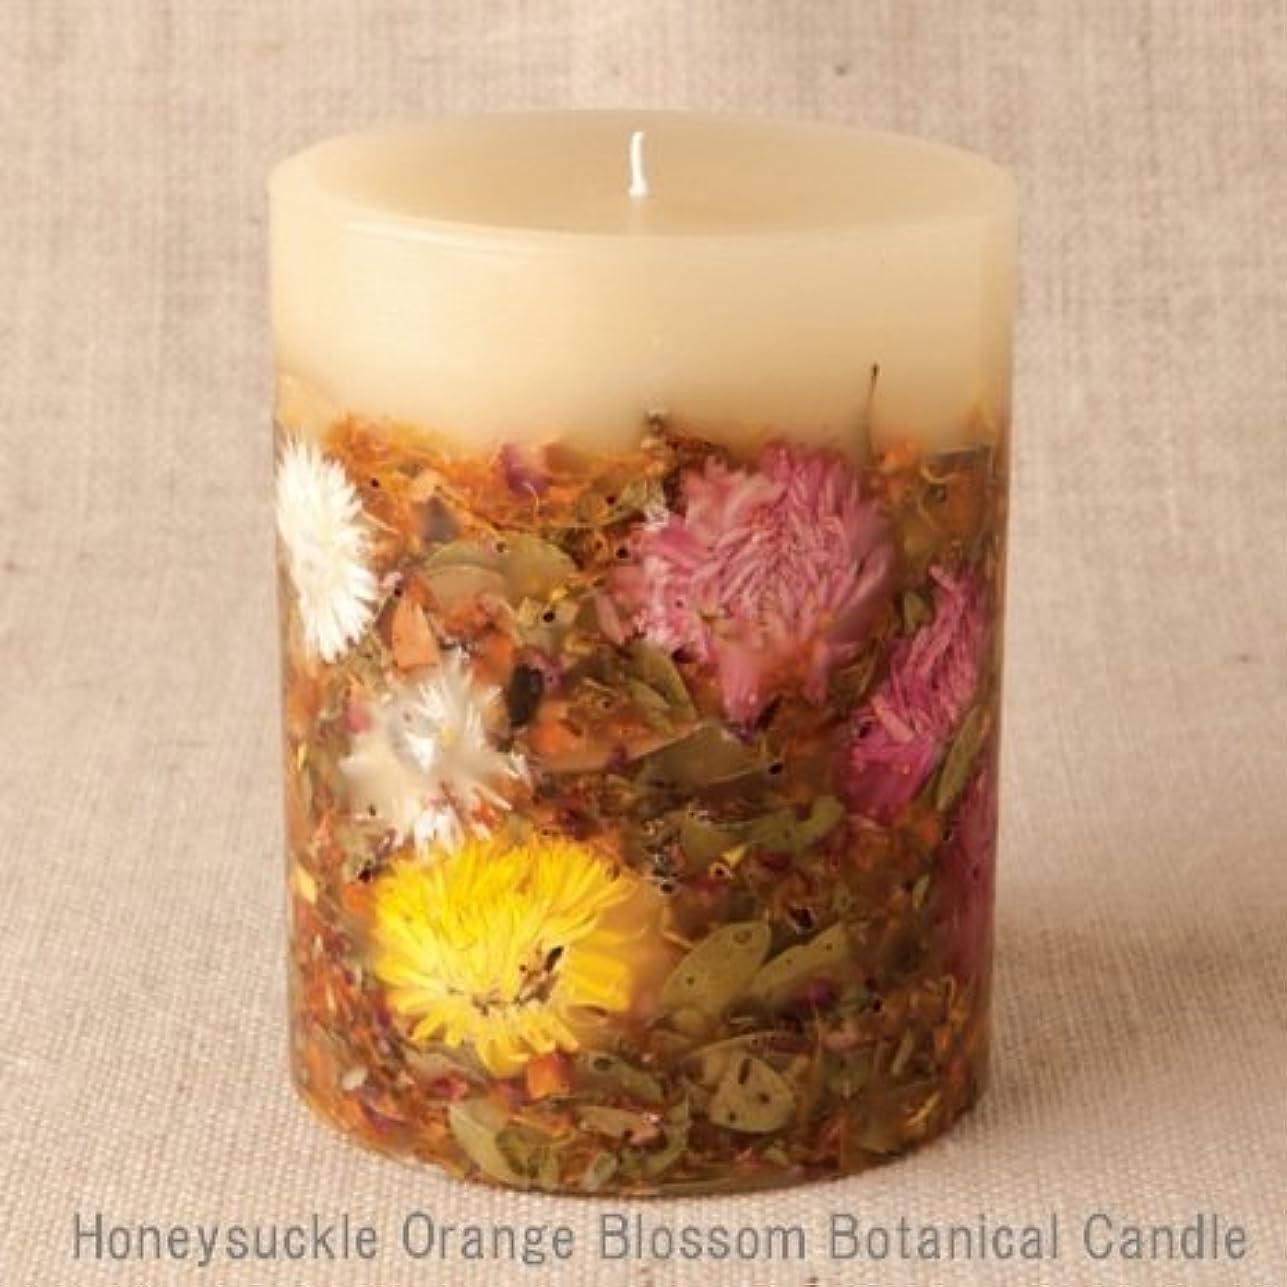 【Rosy Rings ロージーリングス】 Botanical candle キャンドル ハニーサックルオレンジ&ブロッサム